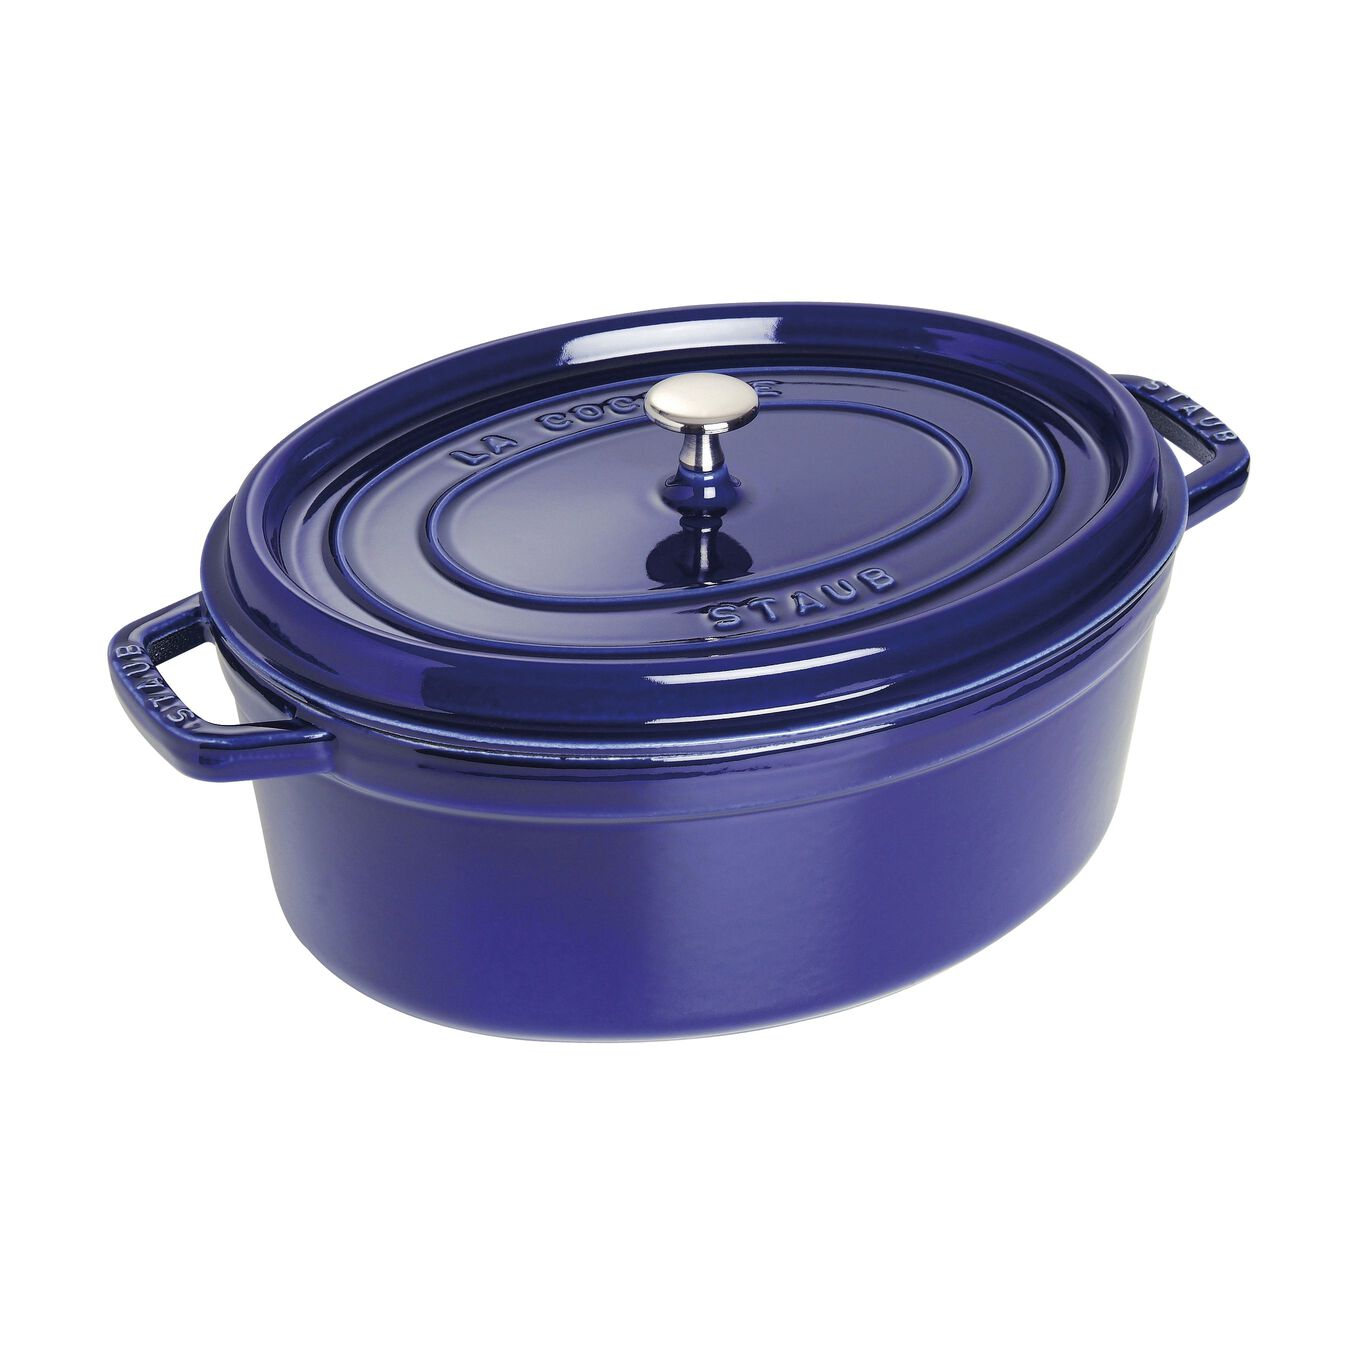 3,25 l Cast iron oval Faitout, Dark-Blue,,large 1